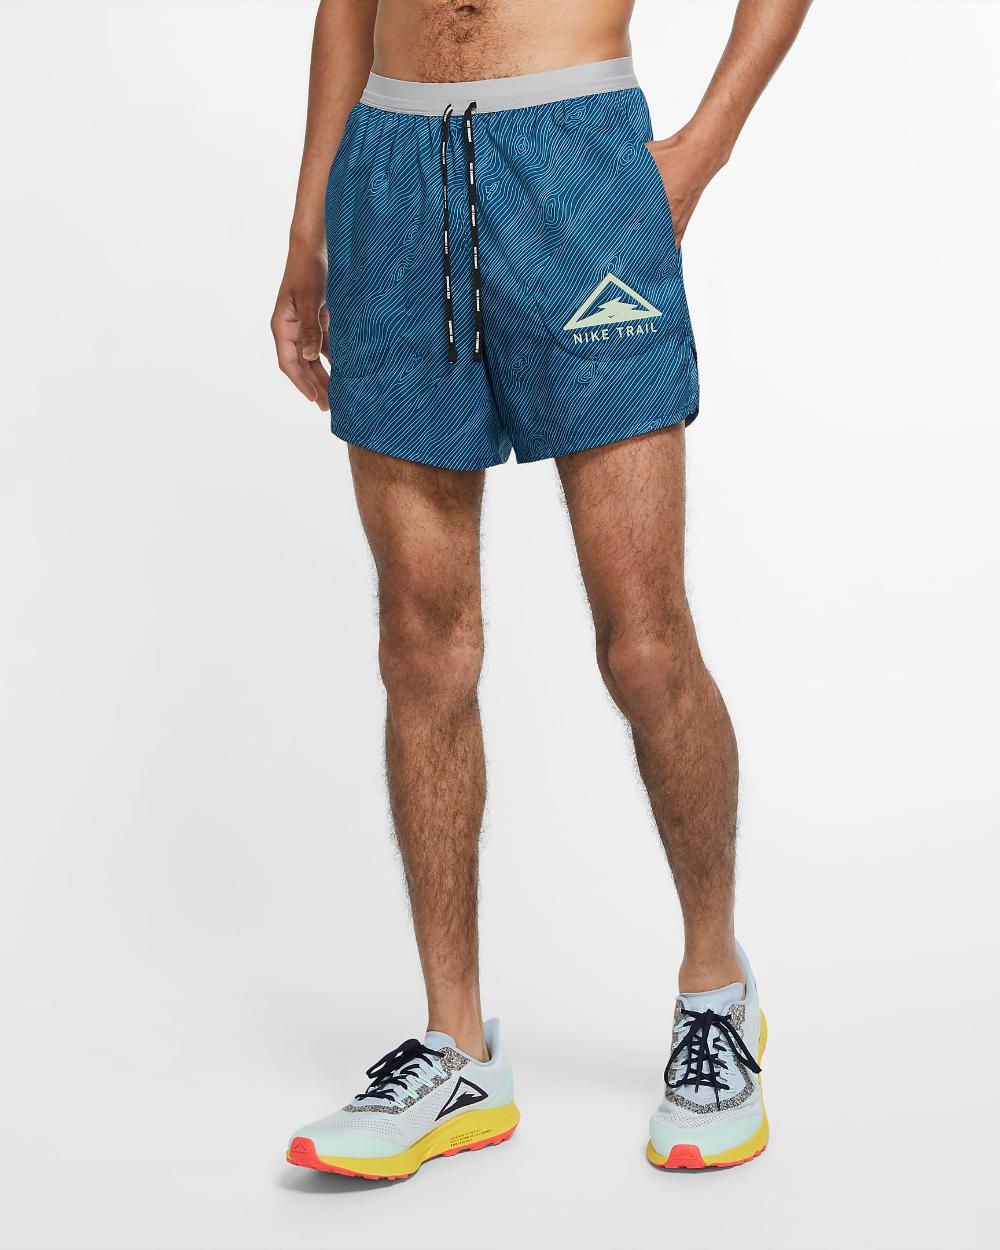 Nike Flex Stride Men S 5 Trail Running Shorts Nike Com In 2021 Running Shorts Trail Running Shorts Running Shorts Men